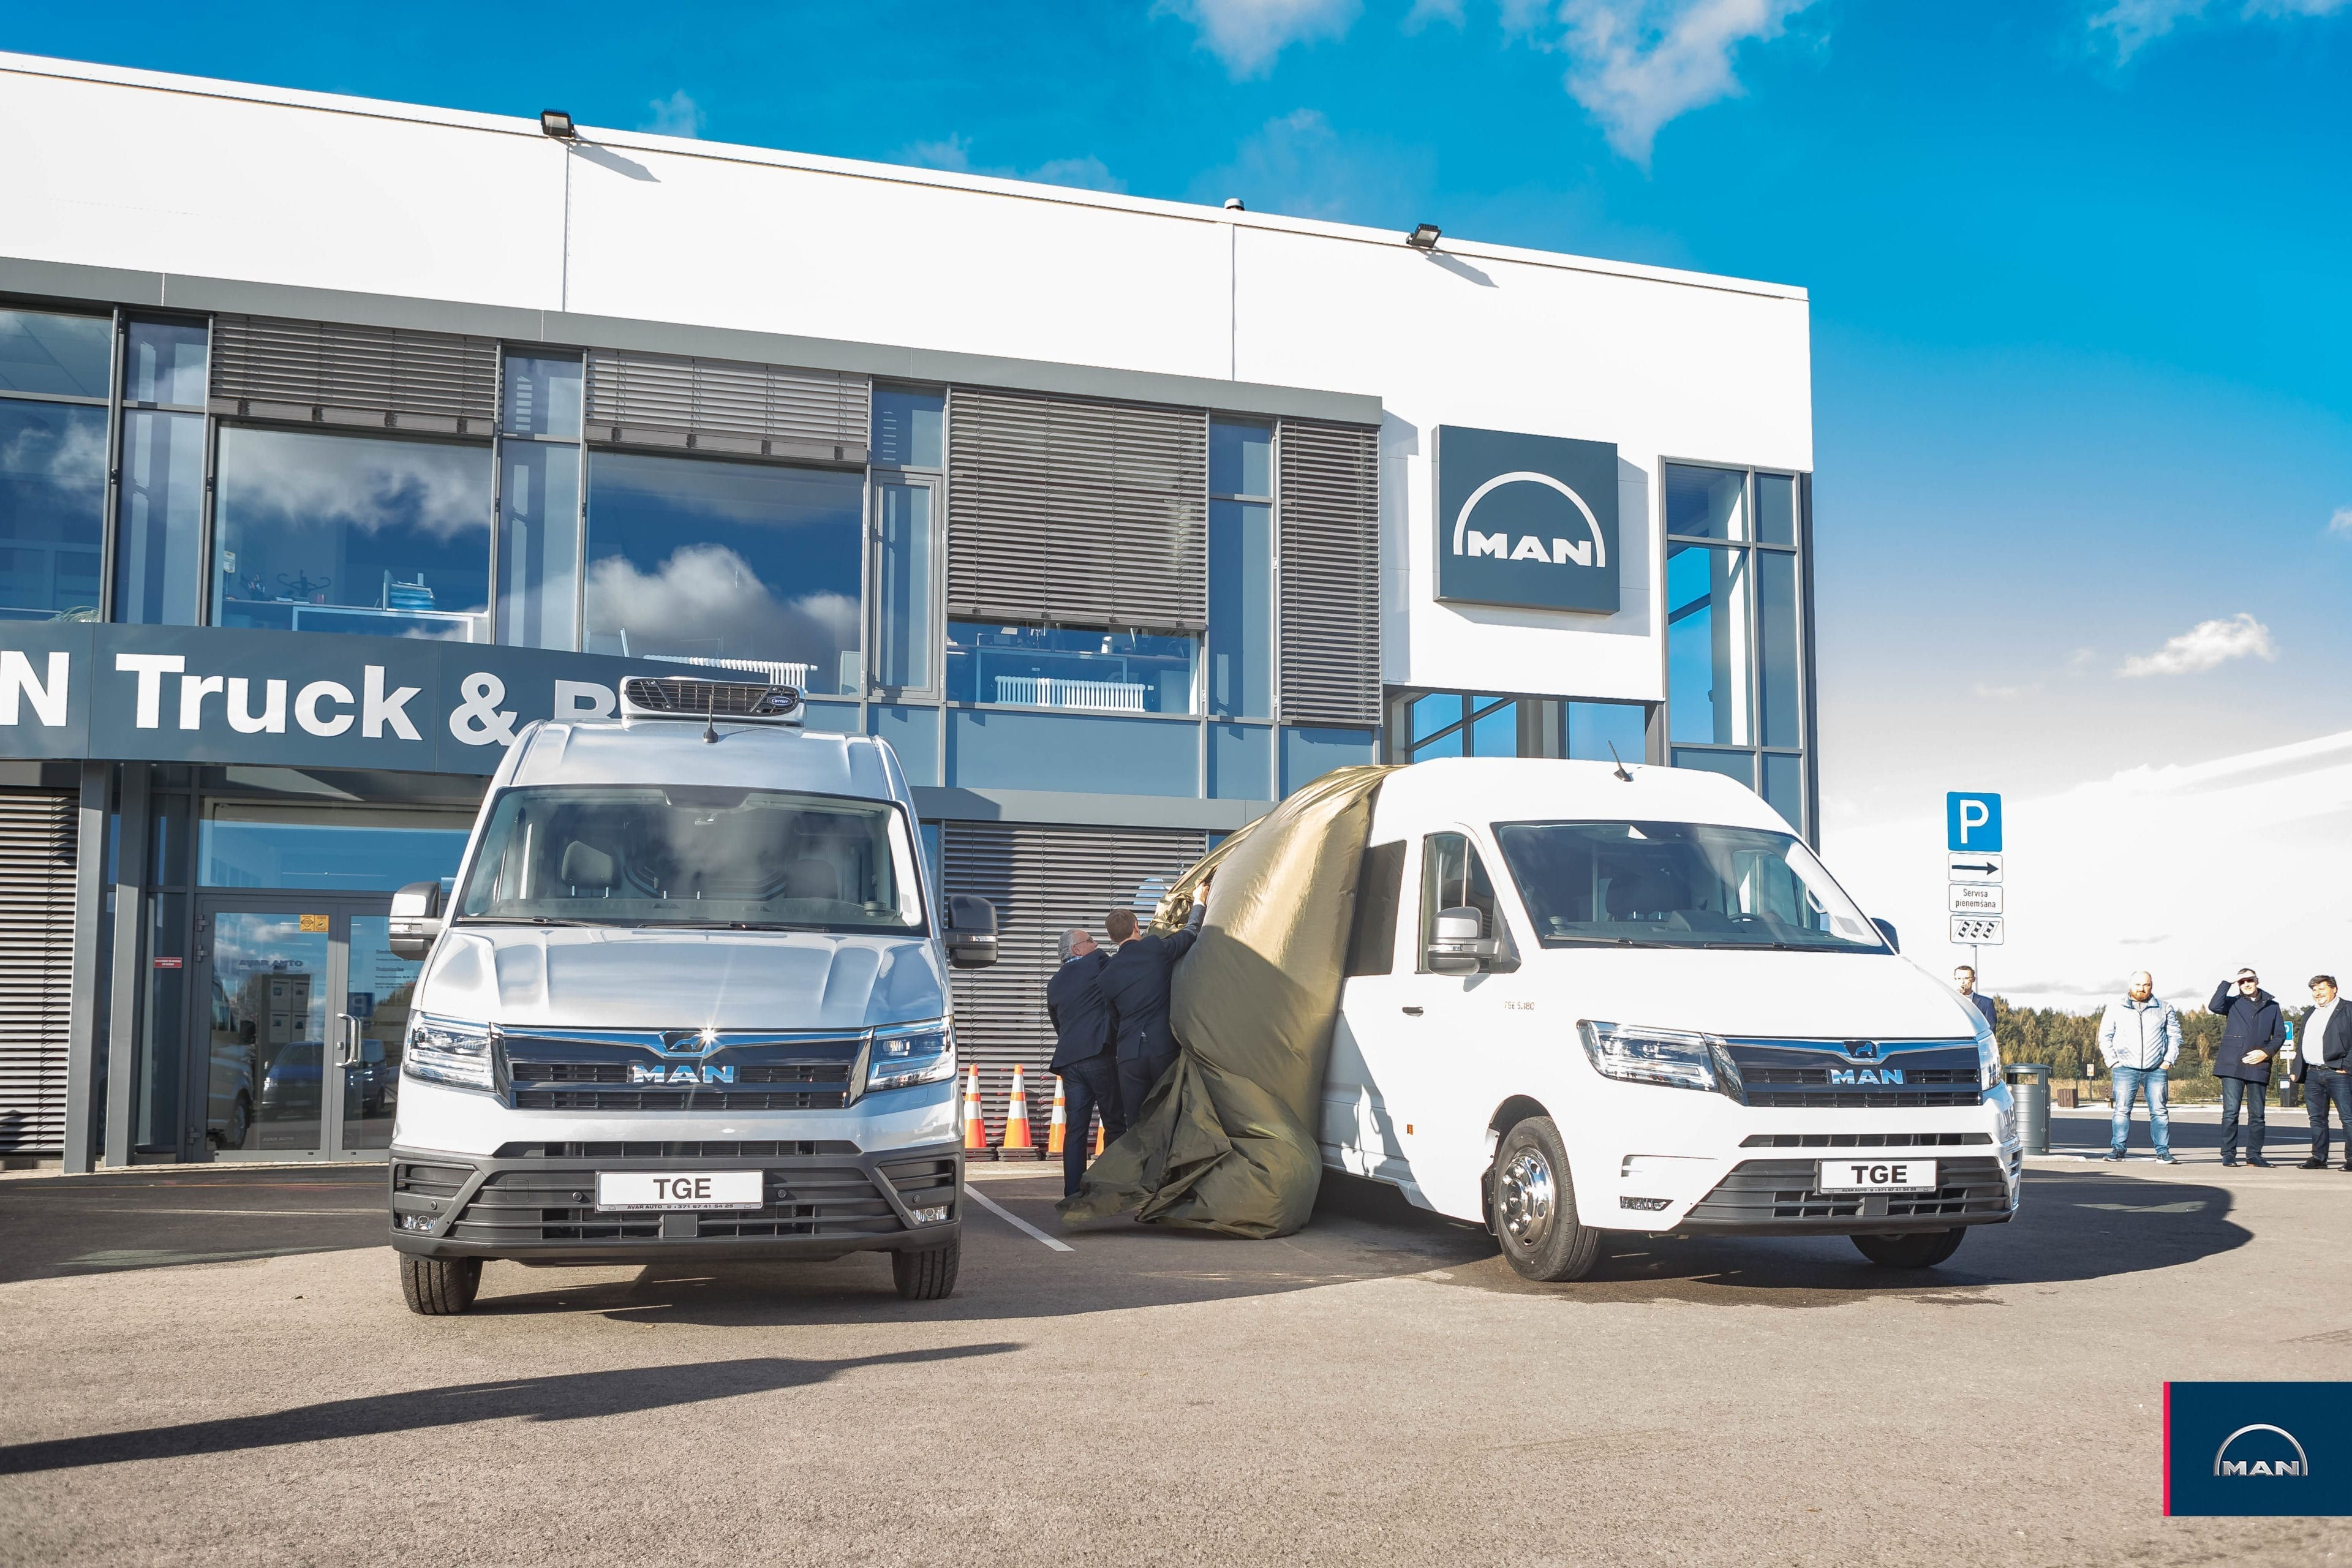 The new MAN TGE van makes its debut in Latvia